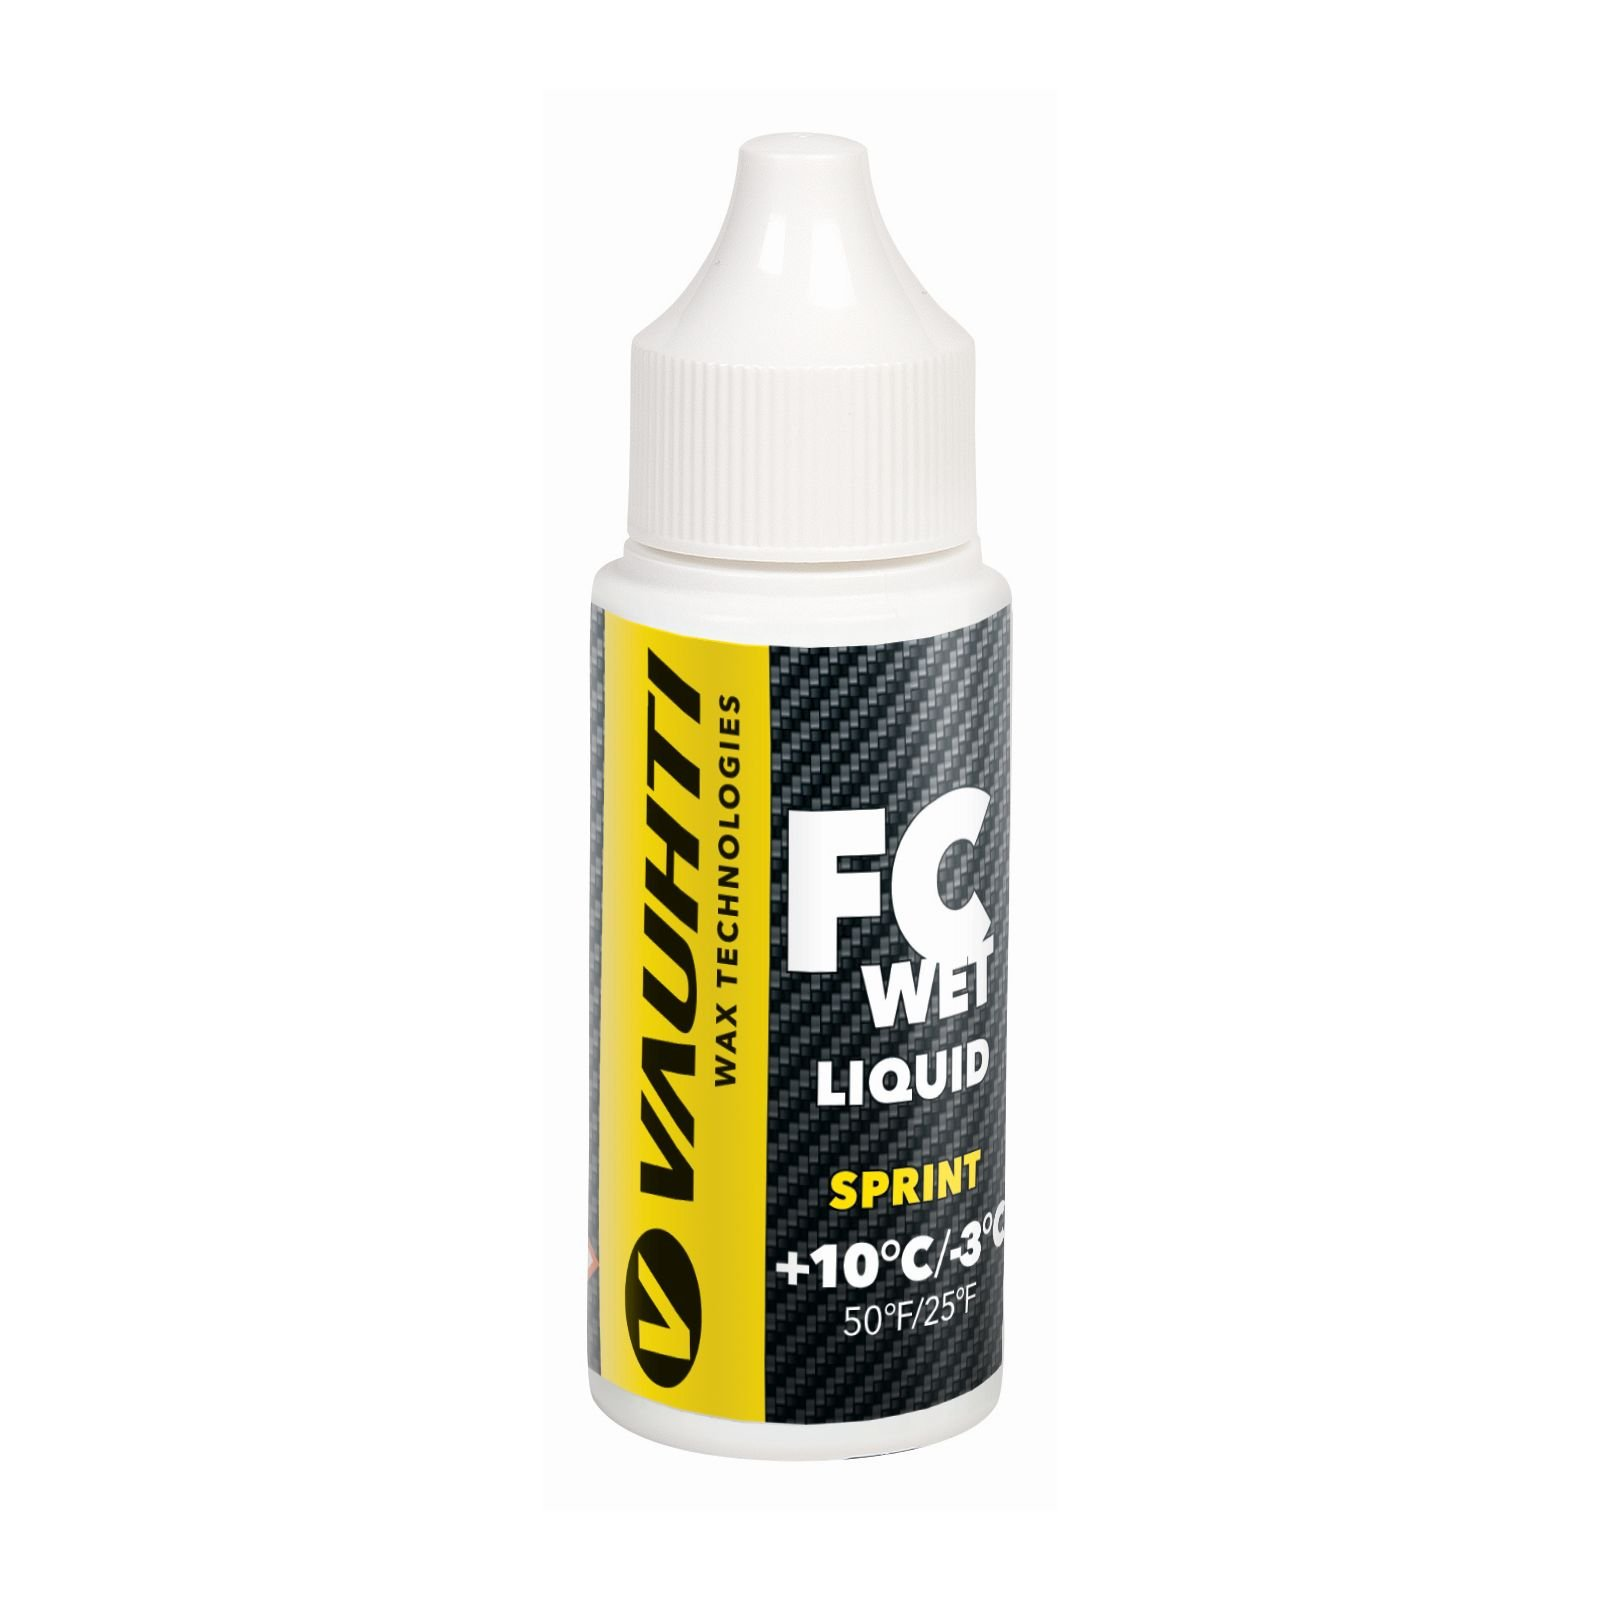 Vauhti FC Fluoro Liquid Wet Sprint by Vauhti